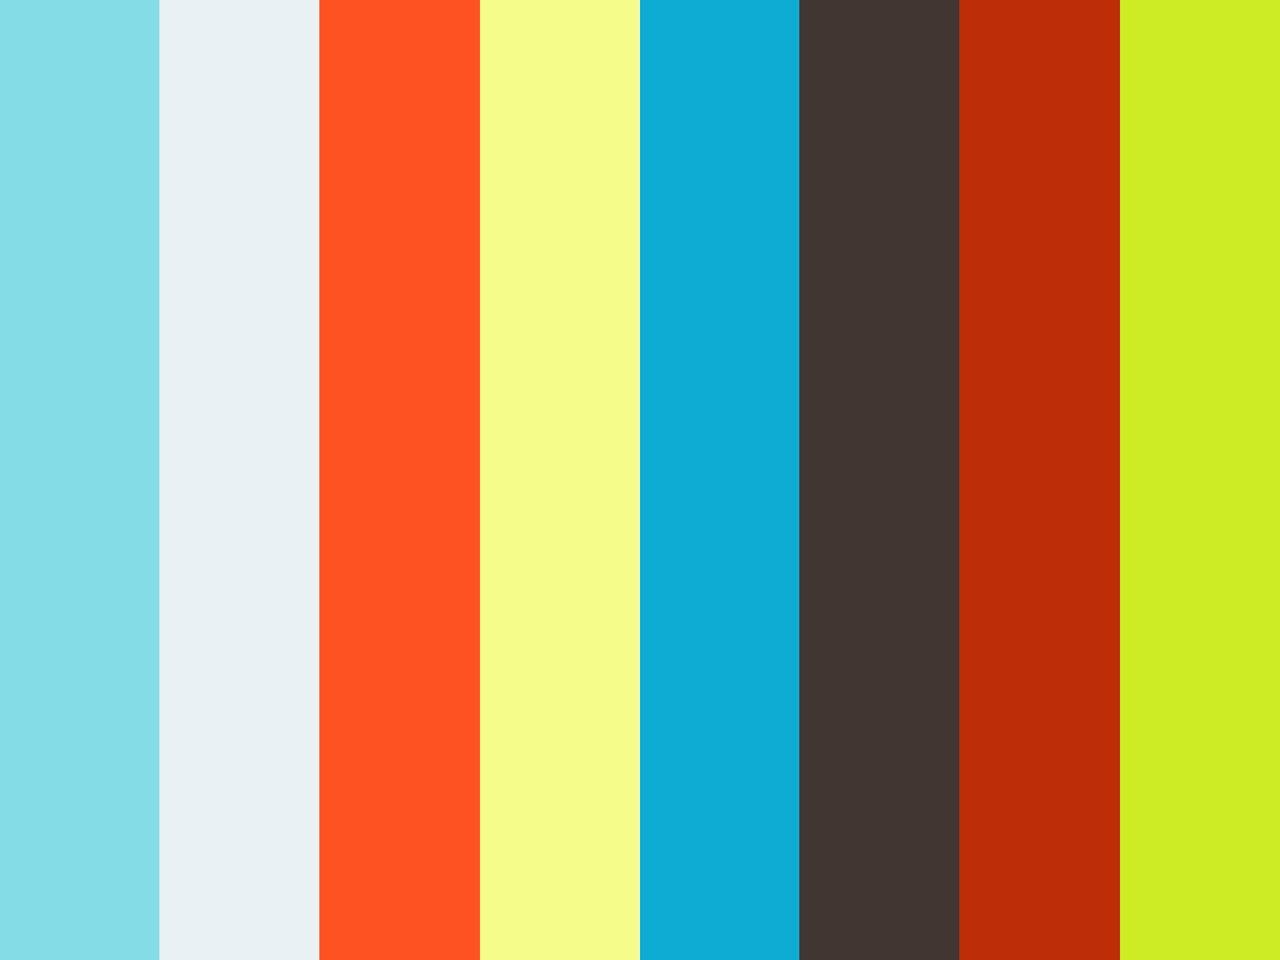 【SDE微電影】東憲 & 維真︱愛情微電影︱當日快剪快播SDE︱高雄香蕉碼頭